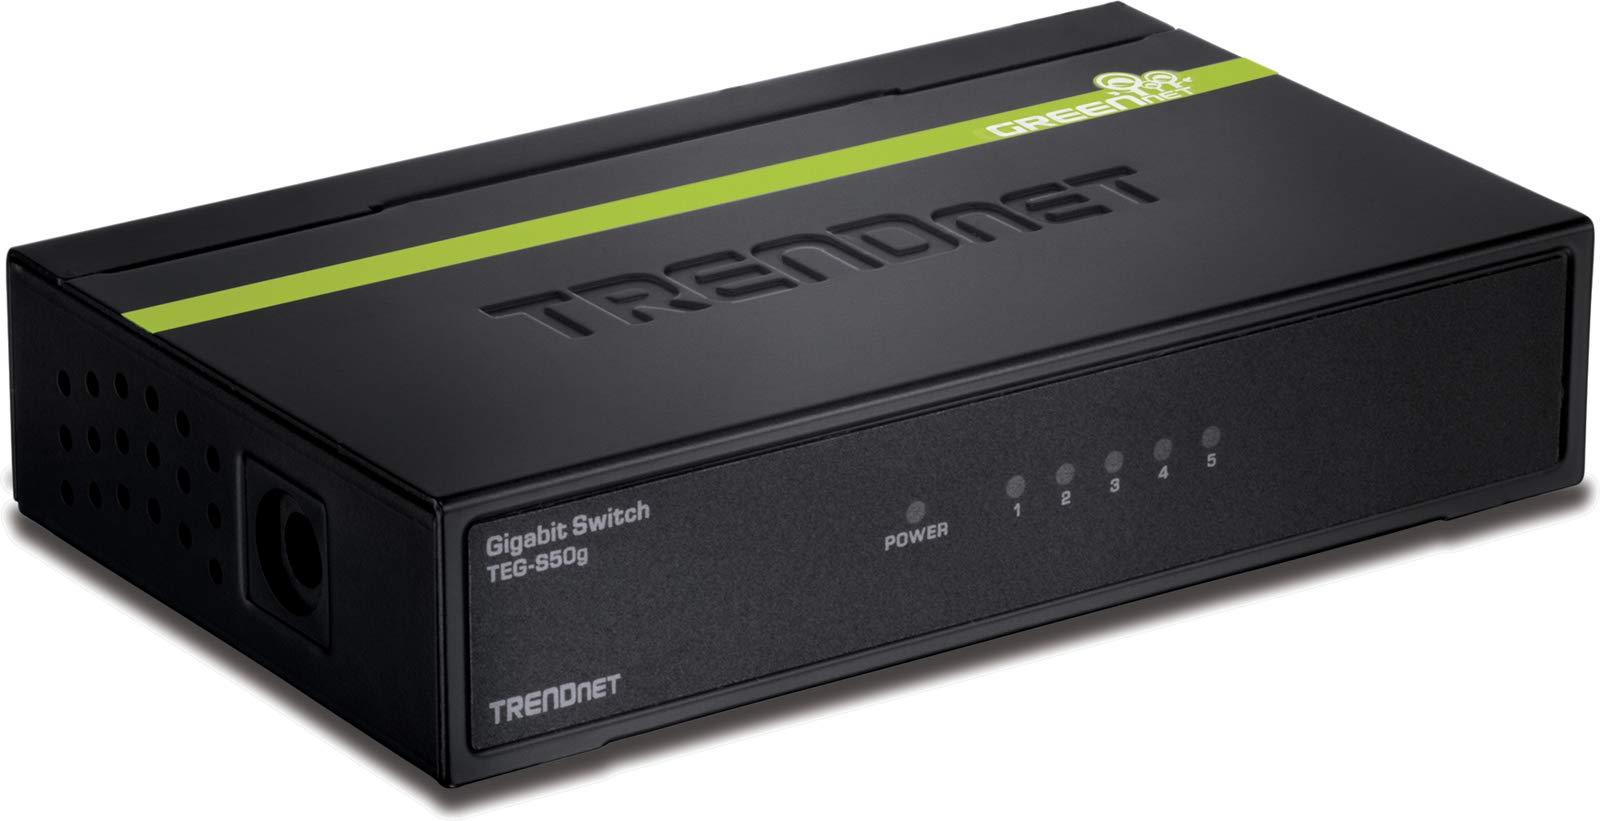 TRENDnet 5-Port Unmanaged Gigabit GREENnet Desktop Metal Switch, TEG-S50g,  Ethernet Splitter, Ethernet/Network Switch, 5 x Gigabit Ports, Fanless, 10 Gbps Switching Fabric, Lifetime Protection by TRENDnet